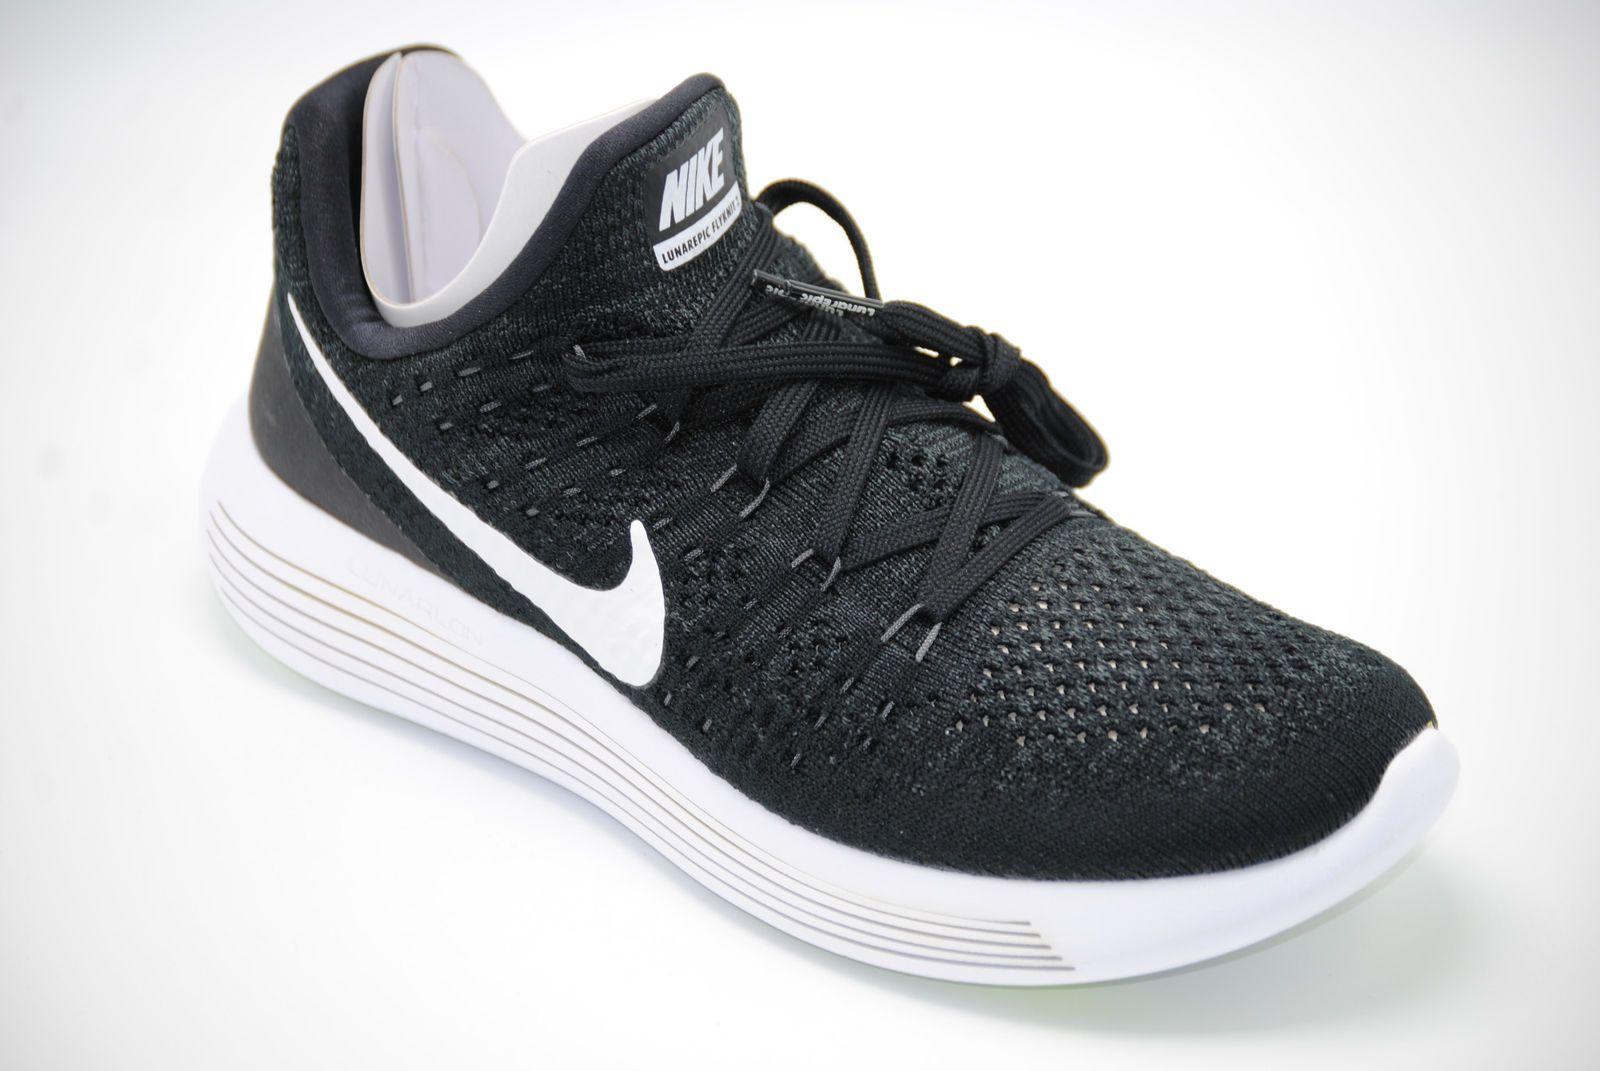 3e766428fcd Nike Lunarepic Low Flyknit 2 Women s running shoes 863780 001 ...